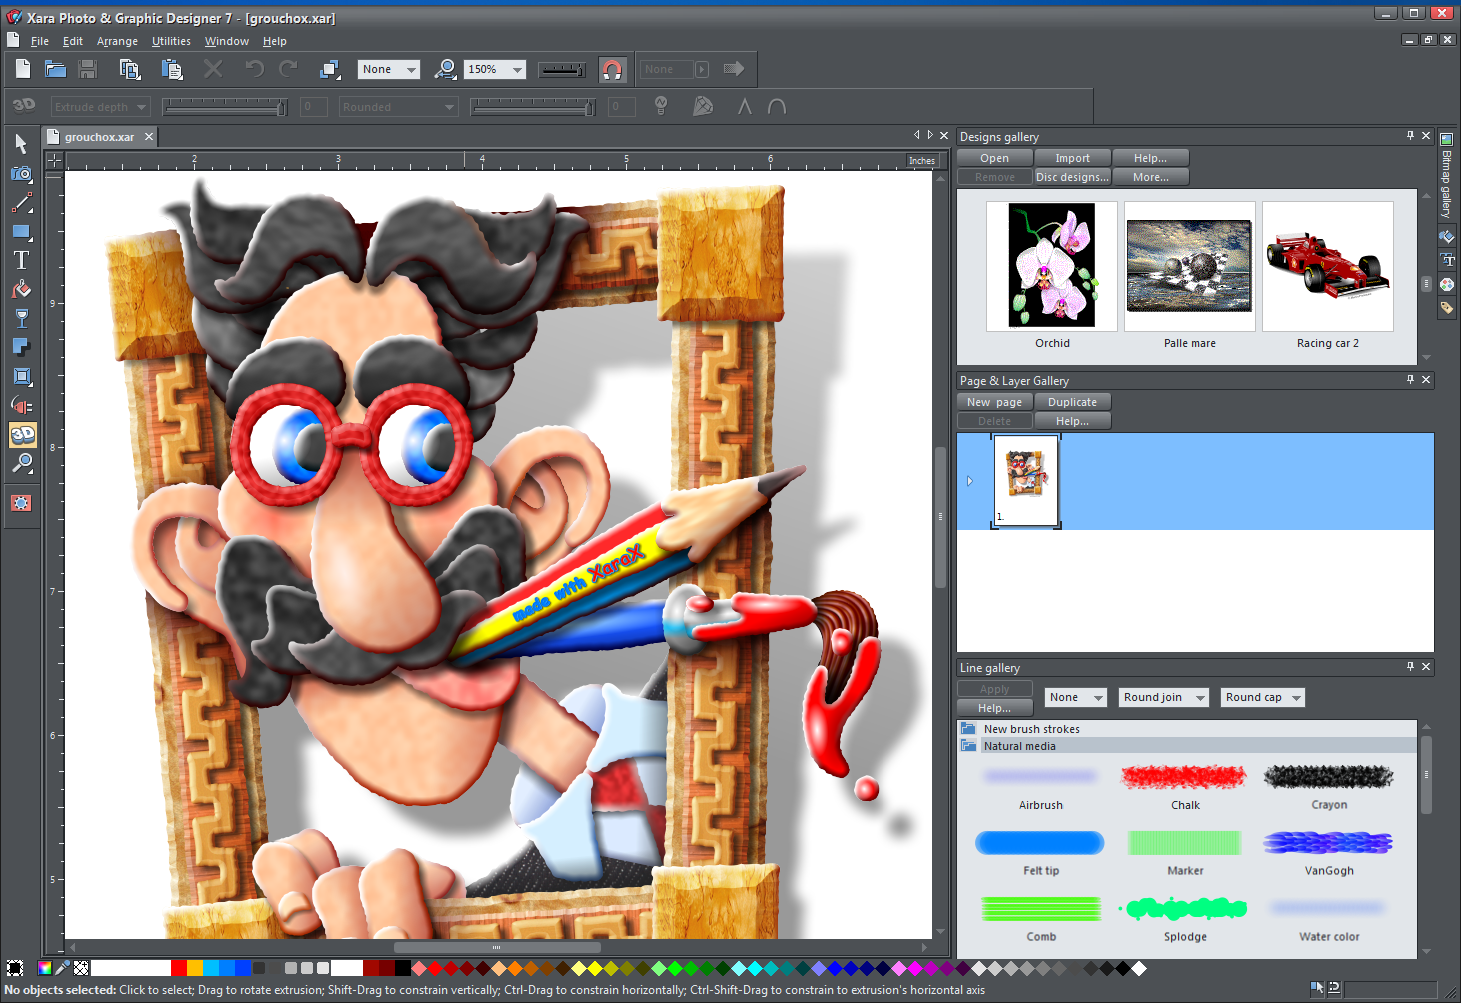 Xara Photo Graphic Designer Screen Shot Graphic Design Software Graphic Design Graphic